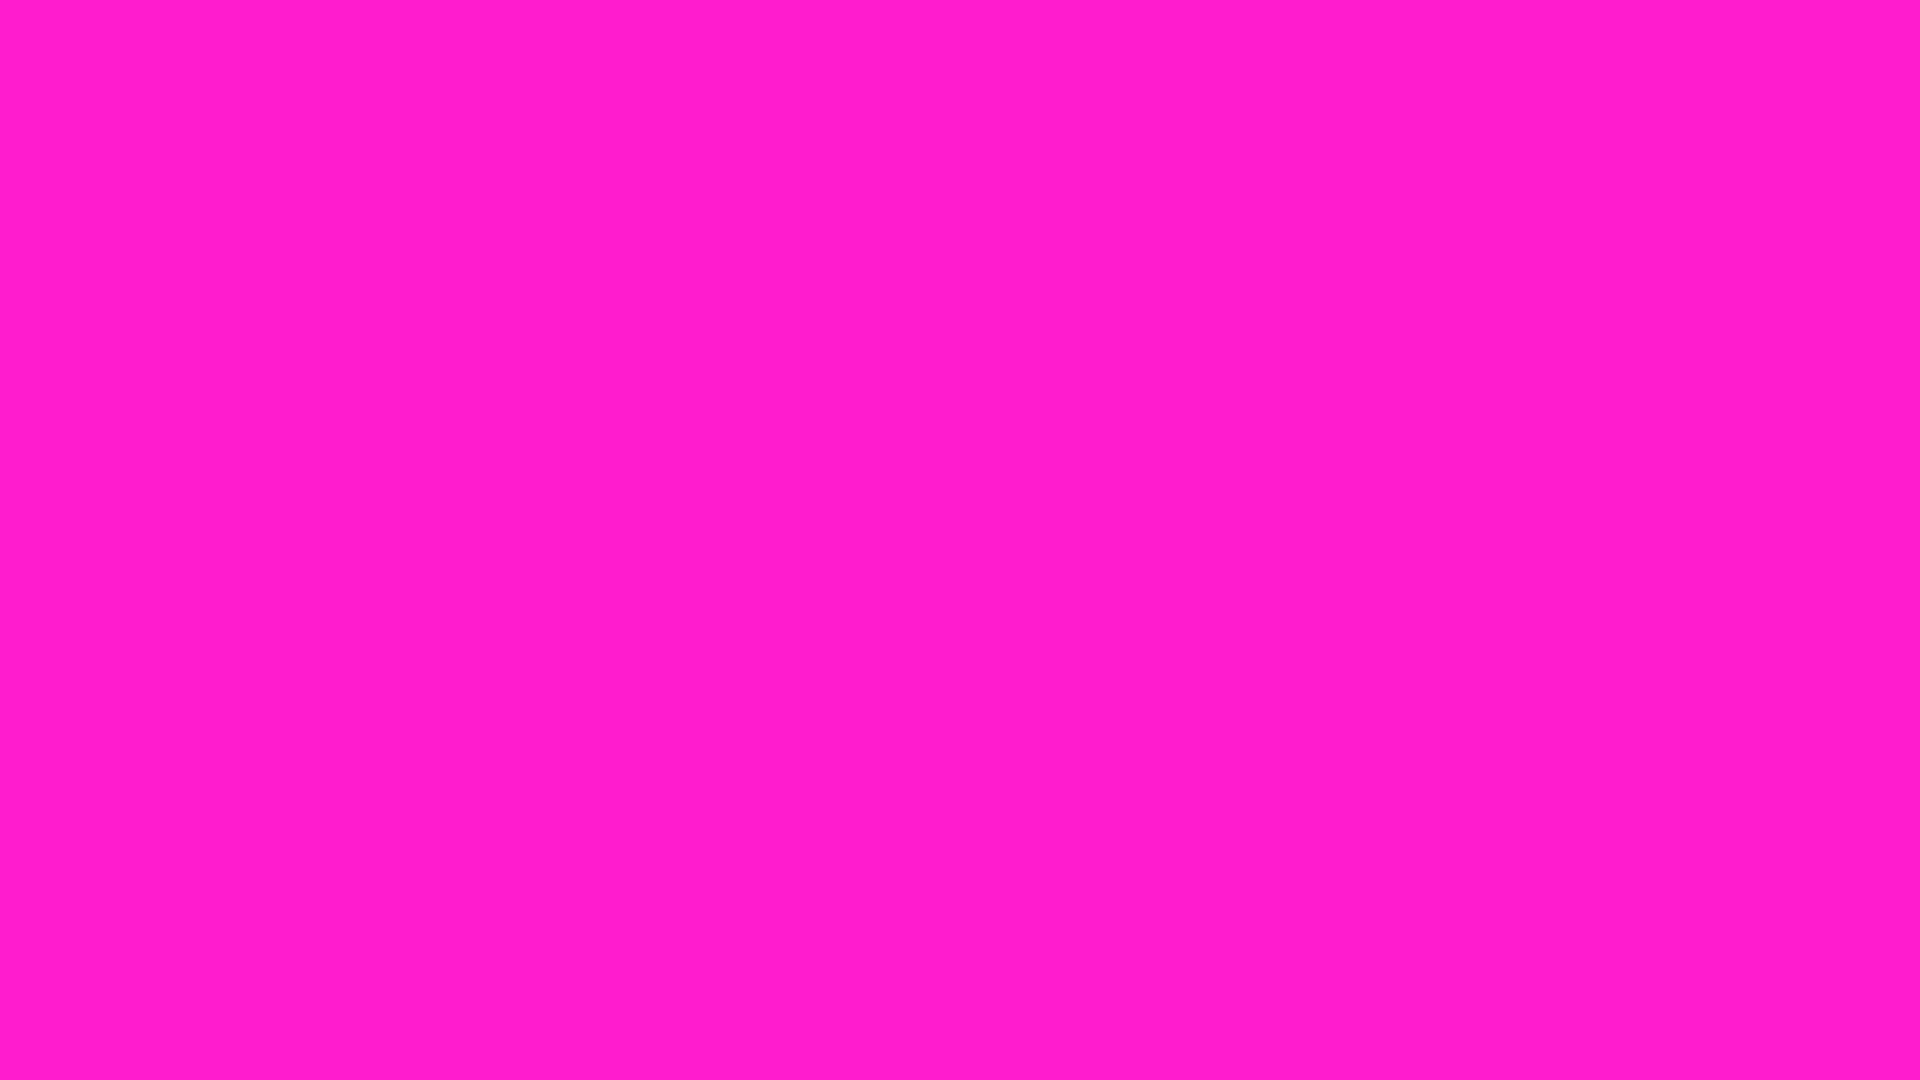 1920x1080 Hot Magenta Solid Color Background